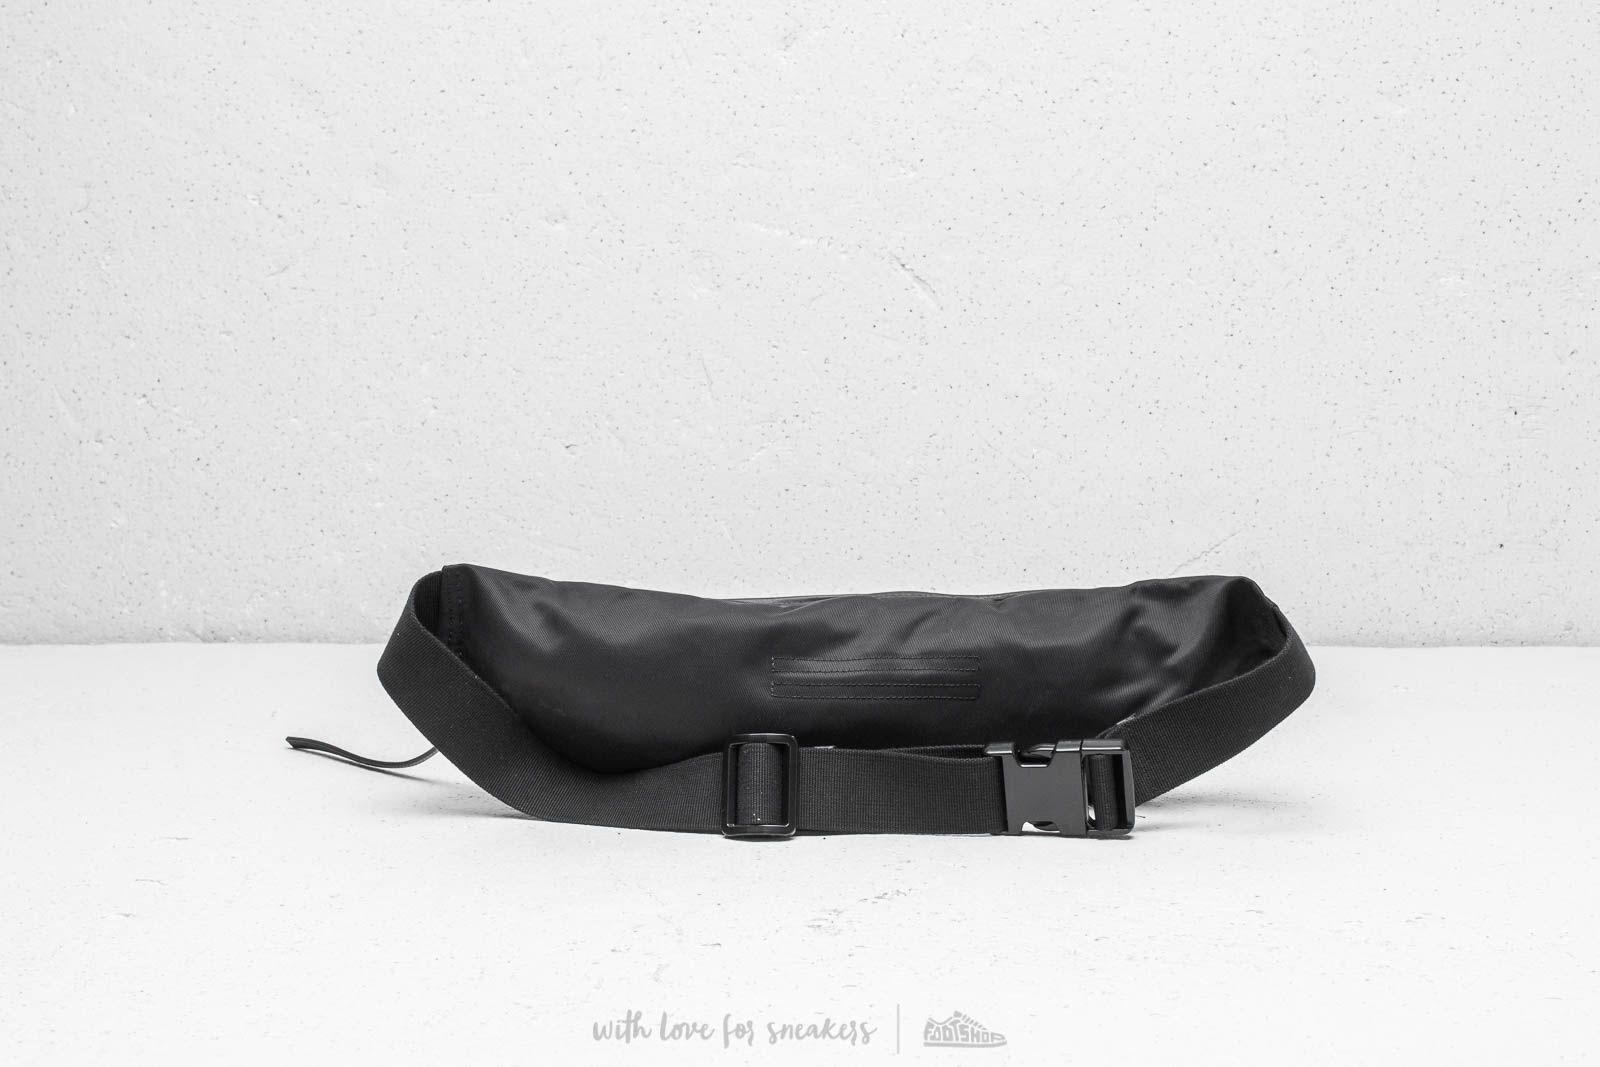 d4728f787 Rick Owens DRKSHDW Belt Bag Black at a great price £189 buy at Footshop